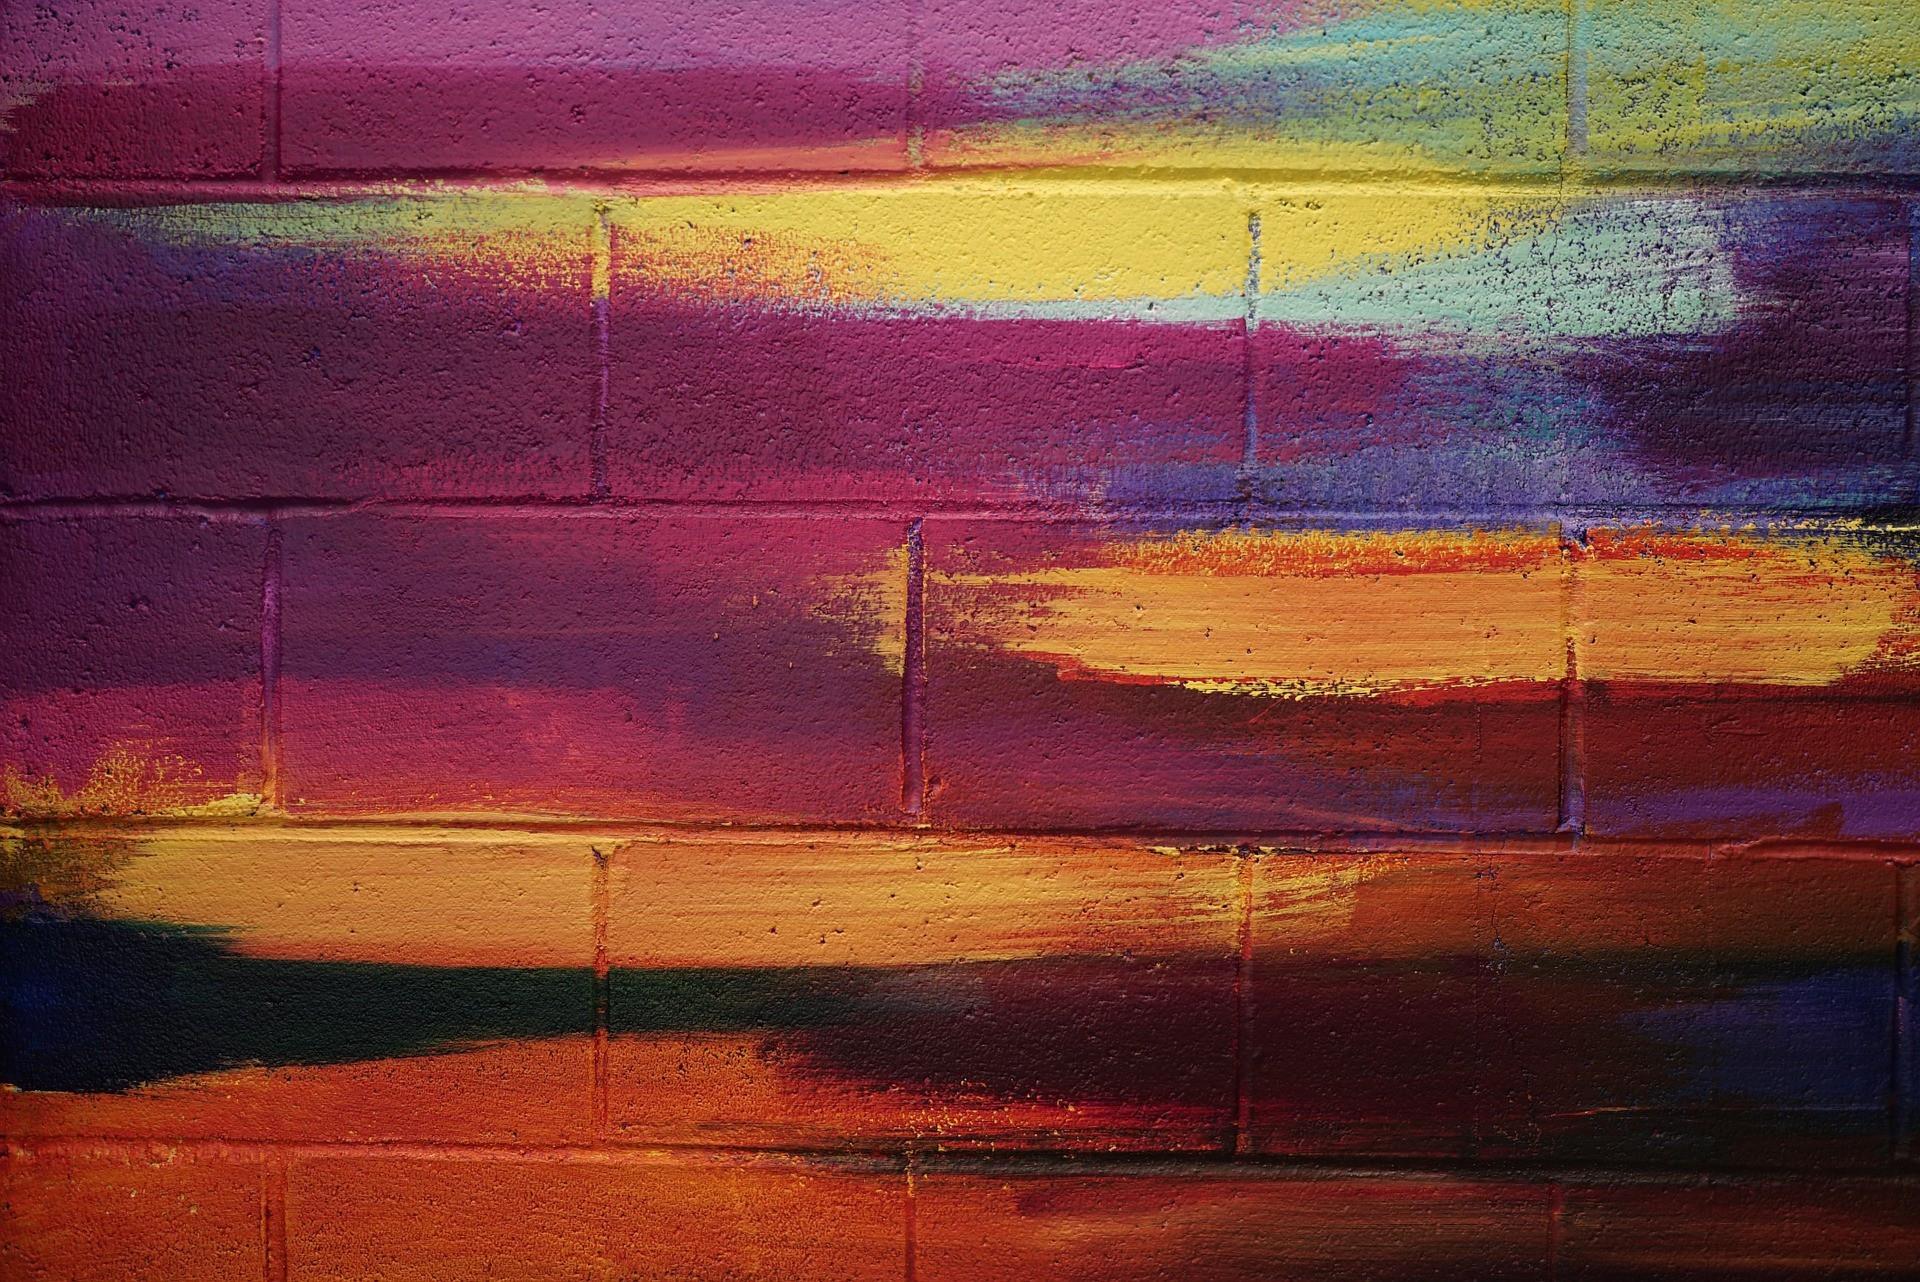 (Foto: fancycrave1/pixabay)Tijolinho colorido